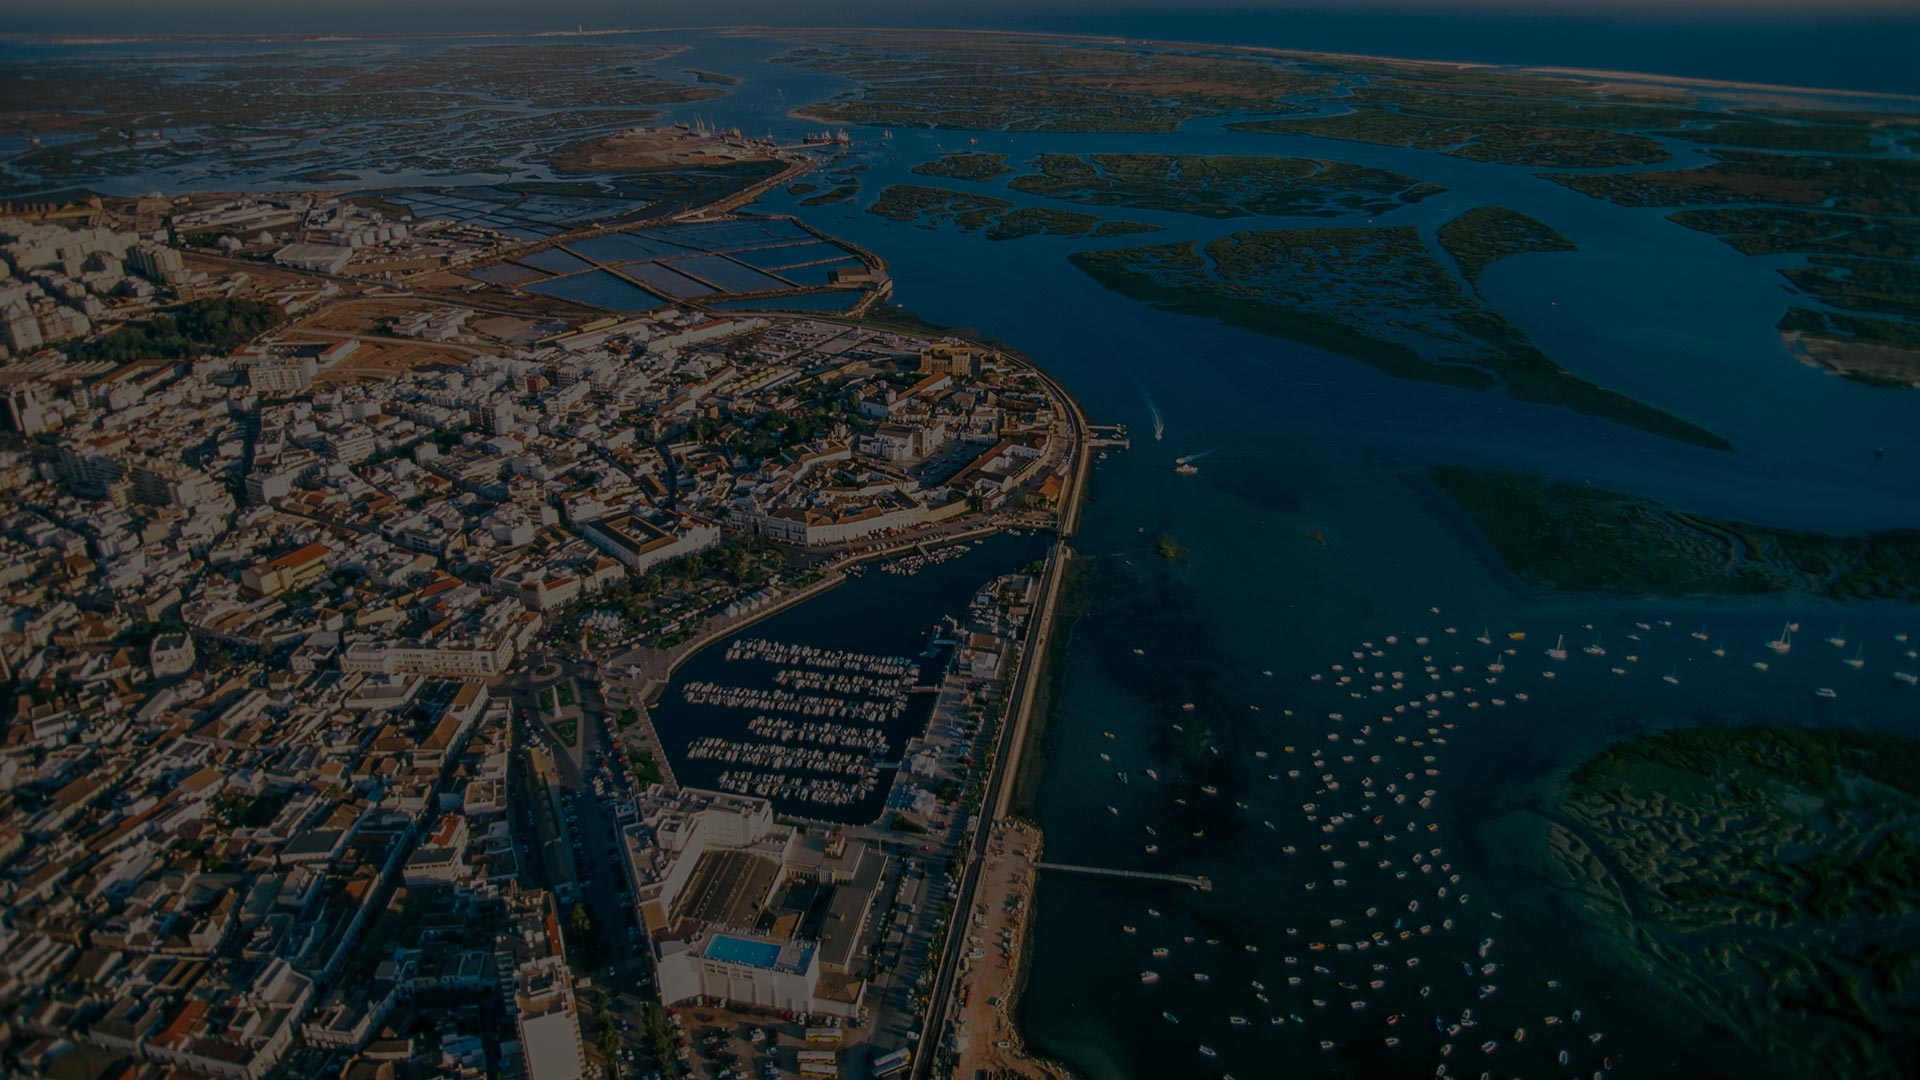 Aerial view of Marina, Faro, Portugal